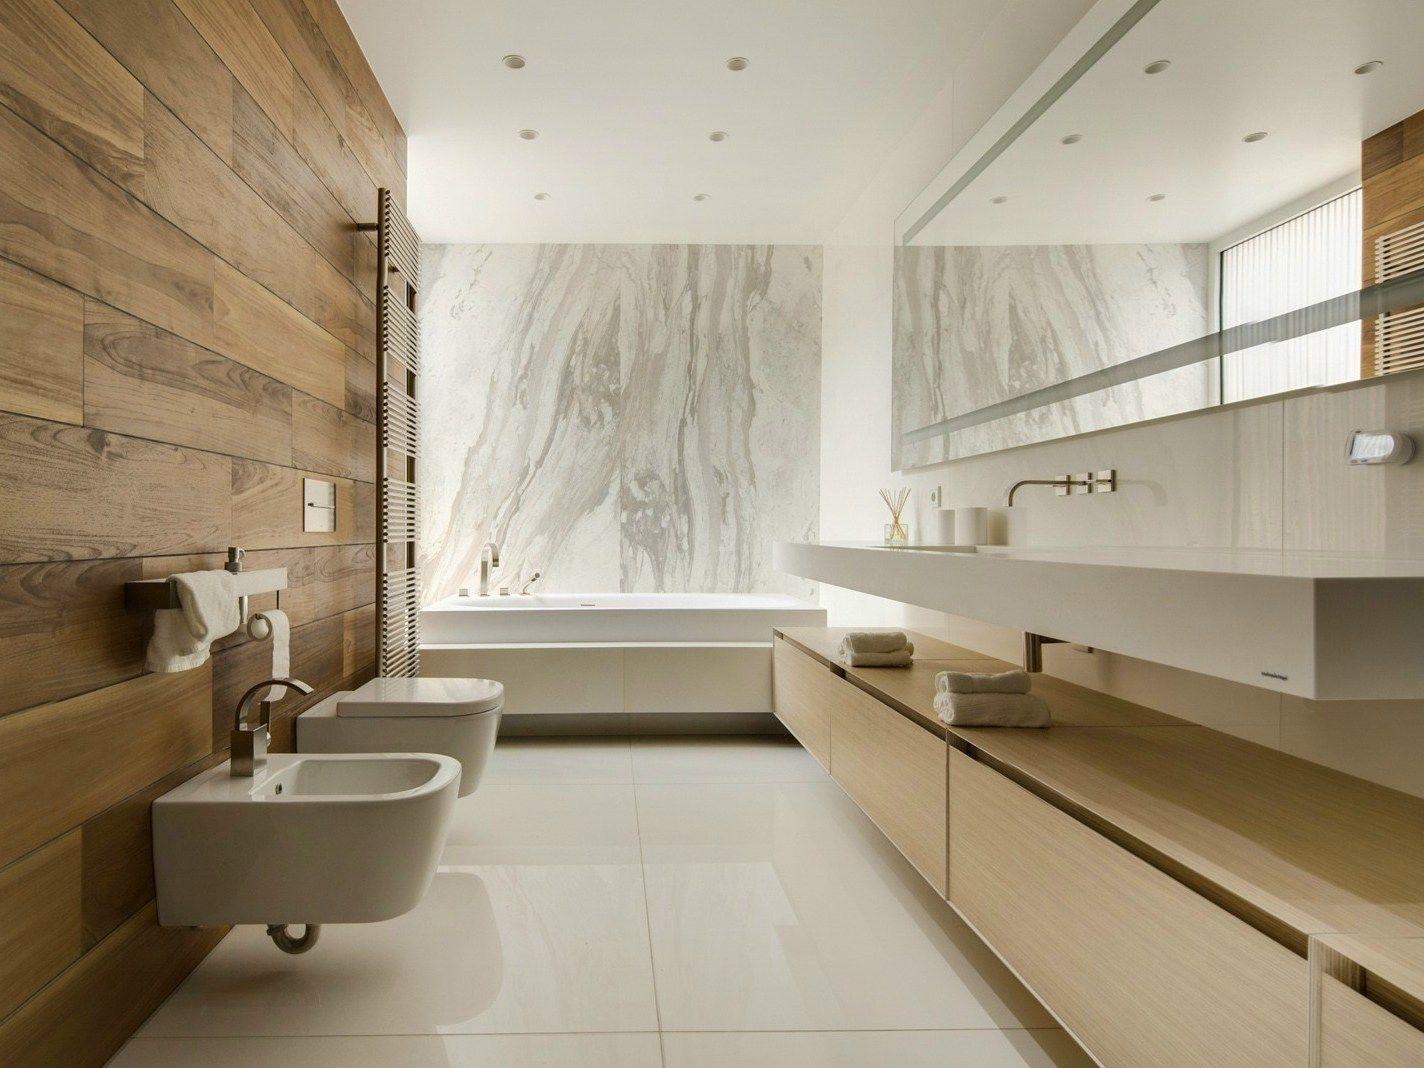 Sala Da Bagno Stile Contemporaneo : The bathroom: a place to pamper oneself luxury villas architectural